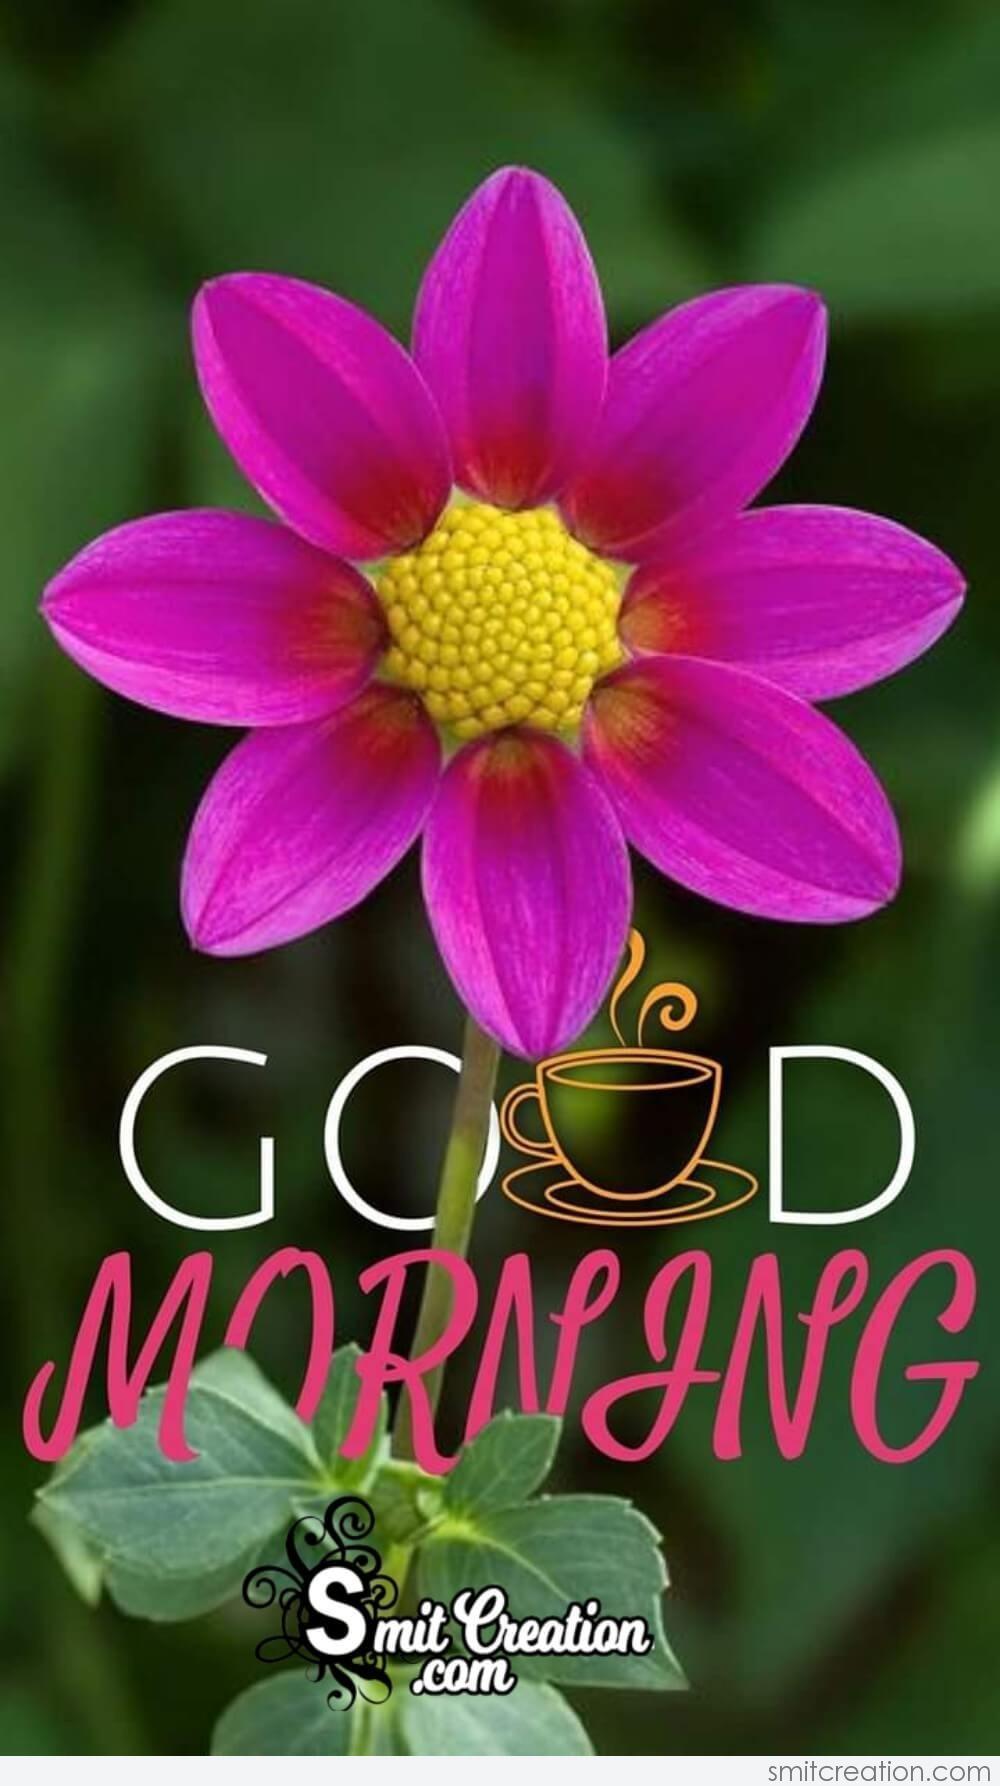 Good Morning Sweet Flower Smitcreation Com